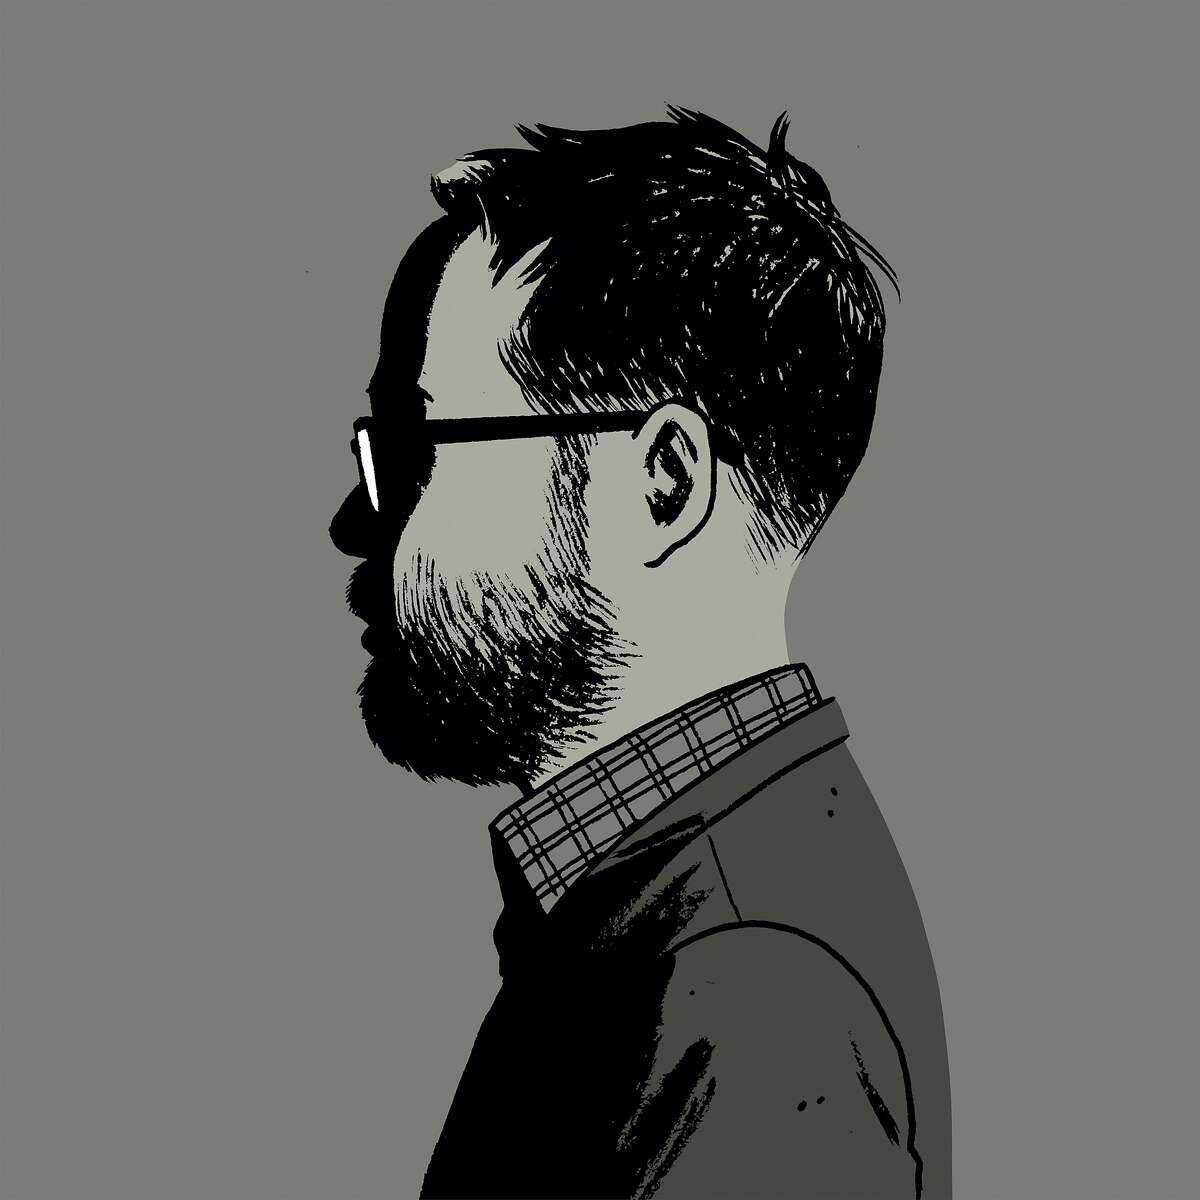 Self-portrait of Adrian Tomine